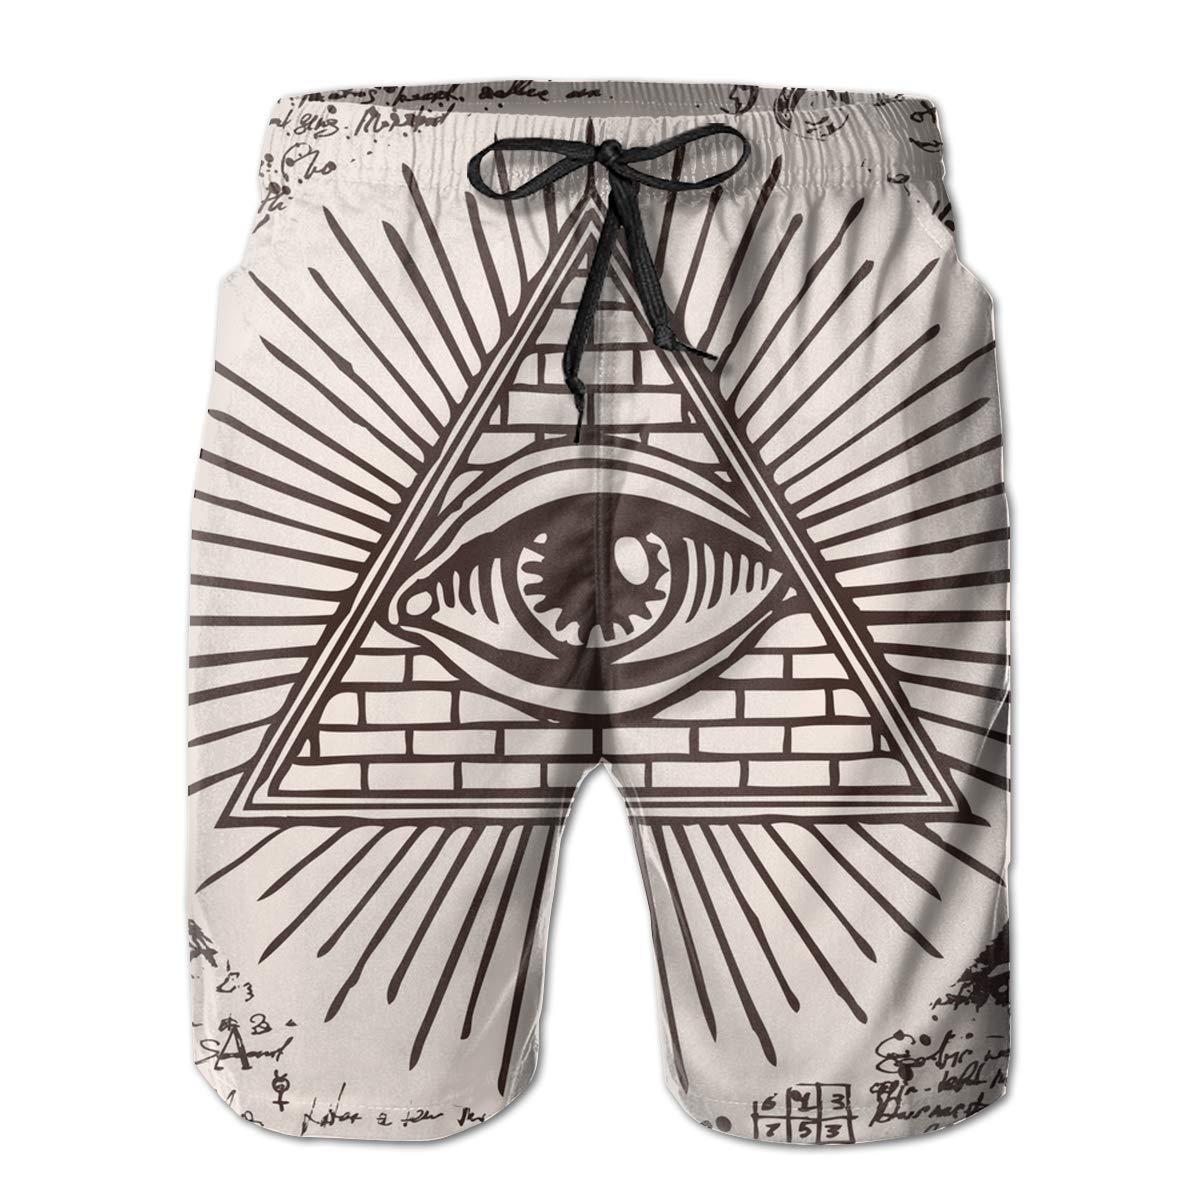 SARA NELL Mens Swim Trunks Freemason Logo God Inside Triangle Pyramid Surfing Beach Board Shorts Swimwear